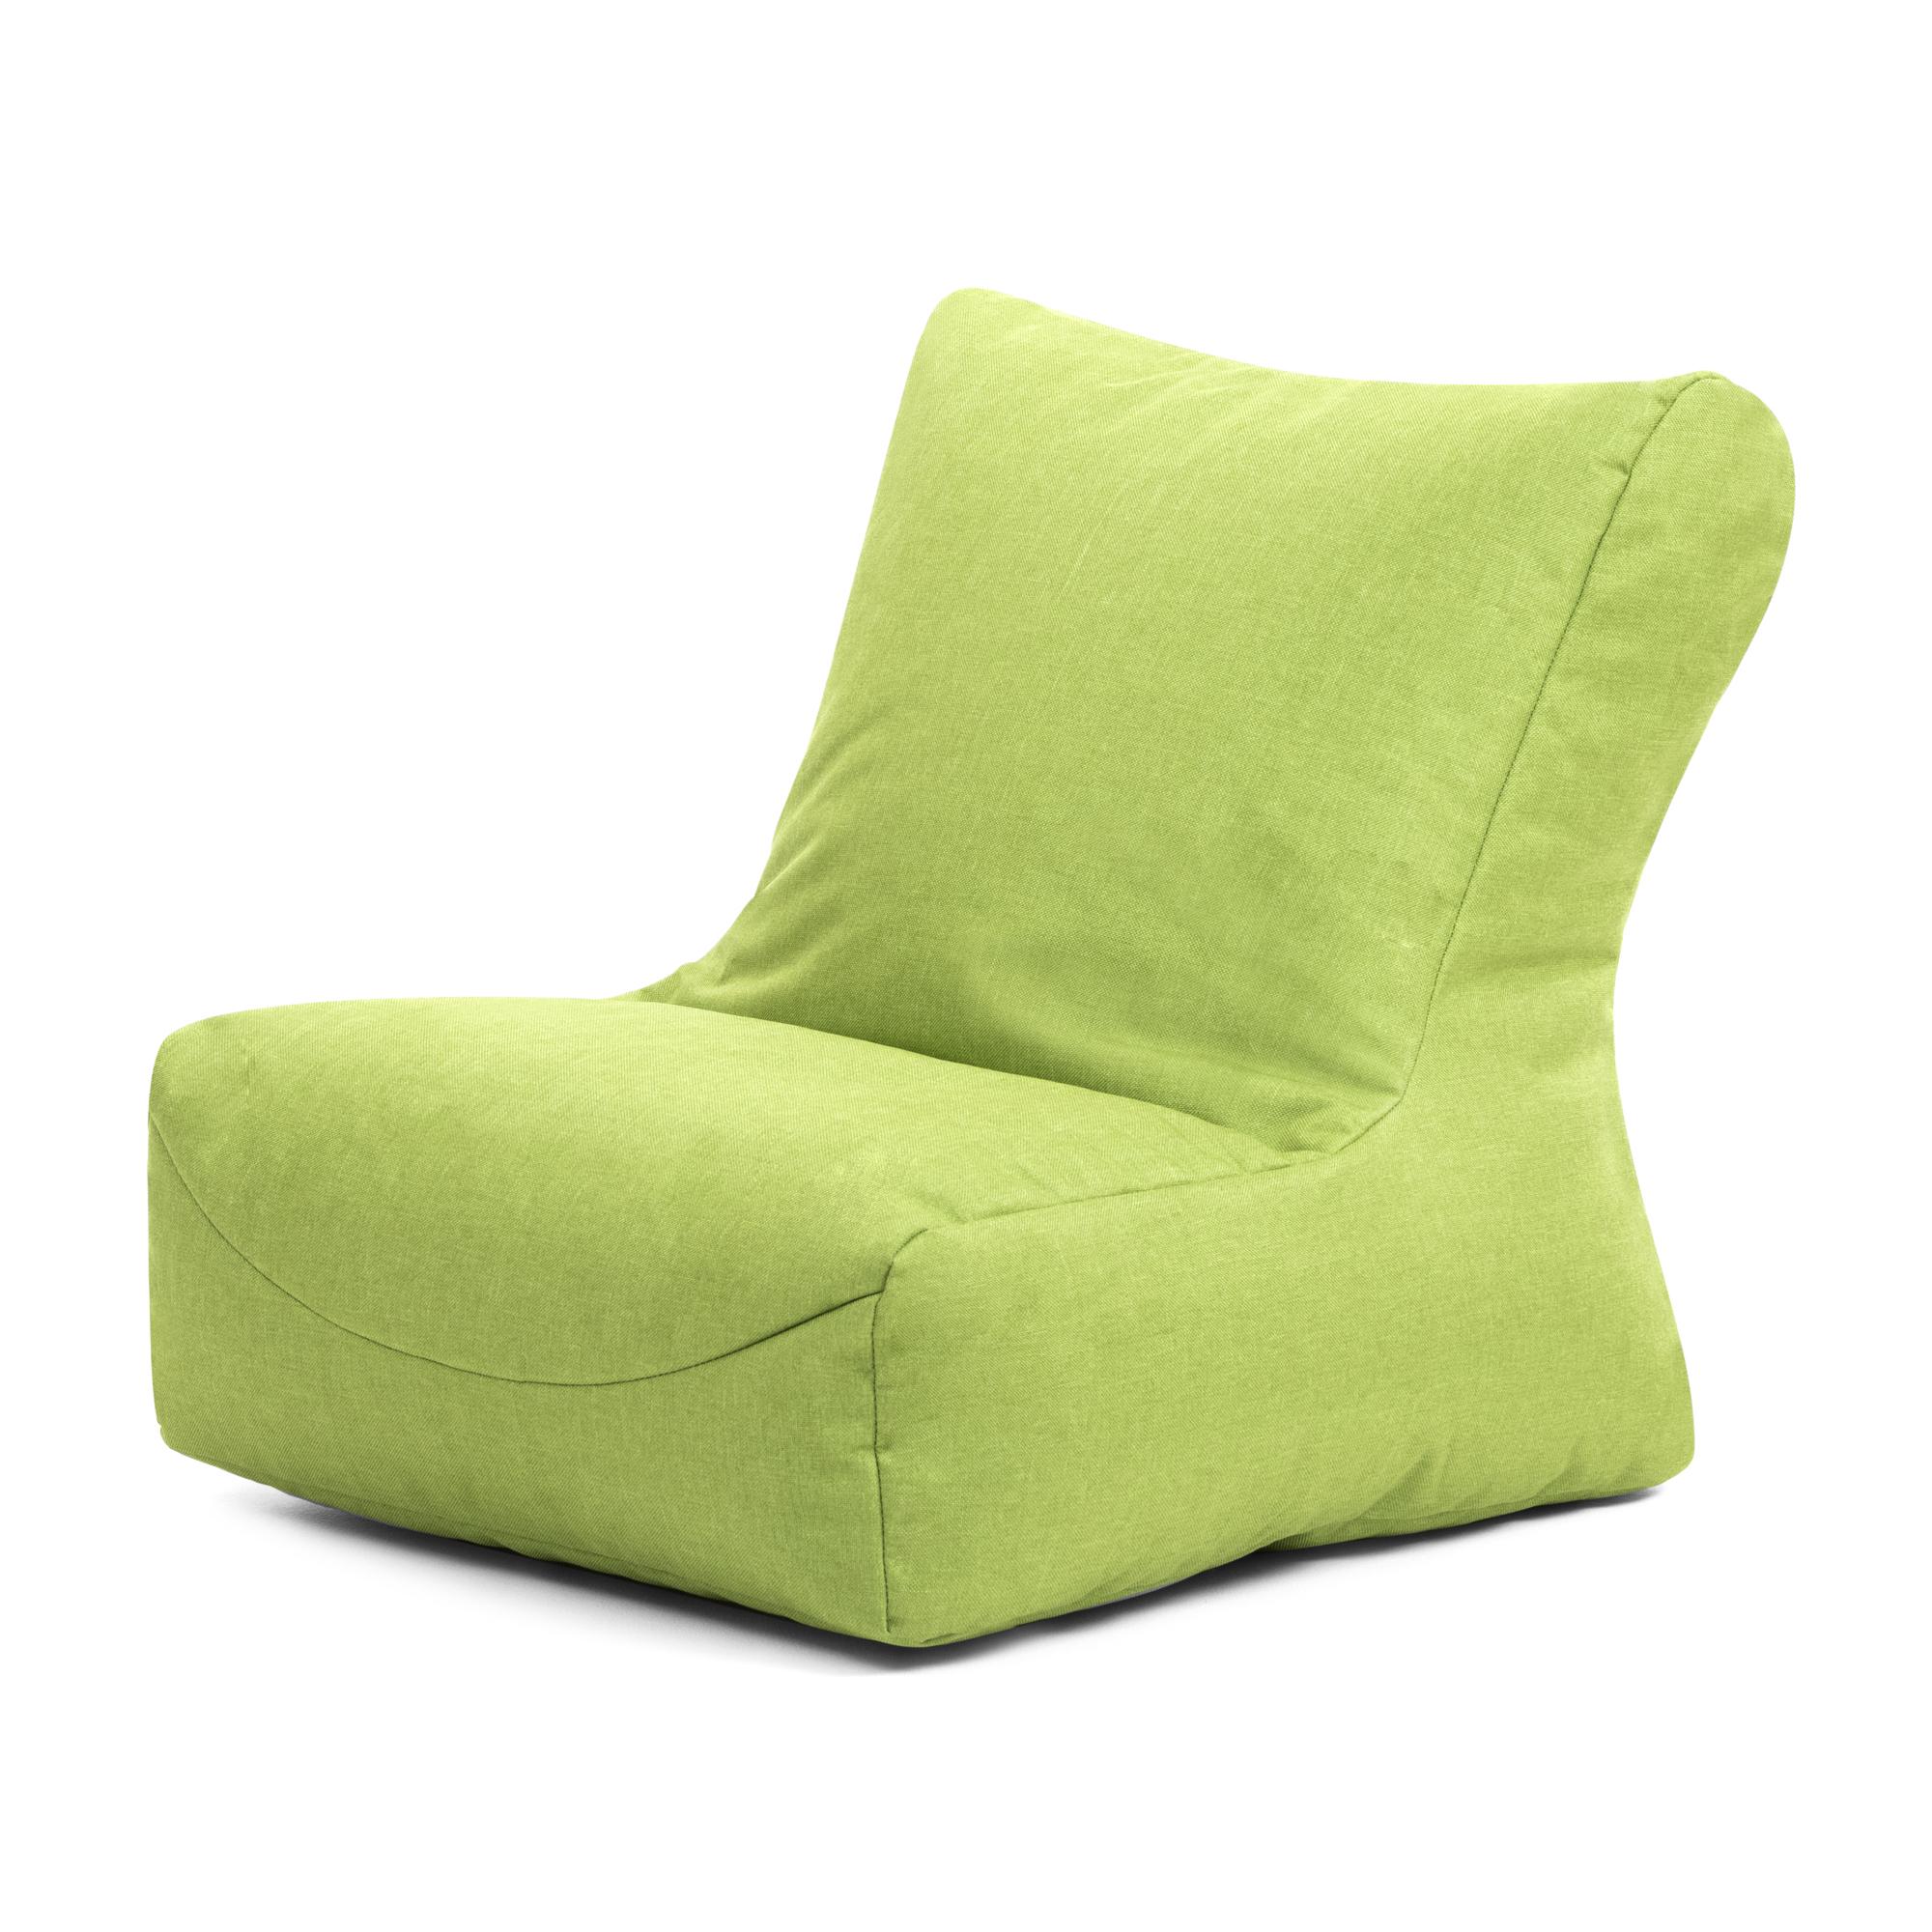 Eden-EY-Smile-Chair-Lime-2-300dpi